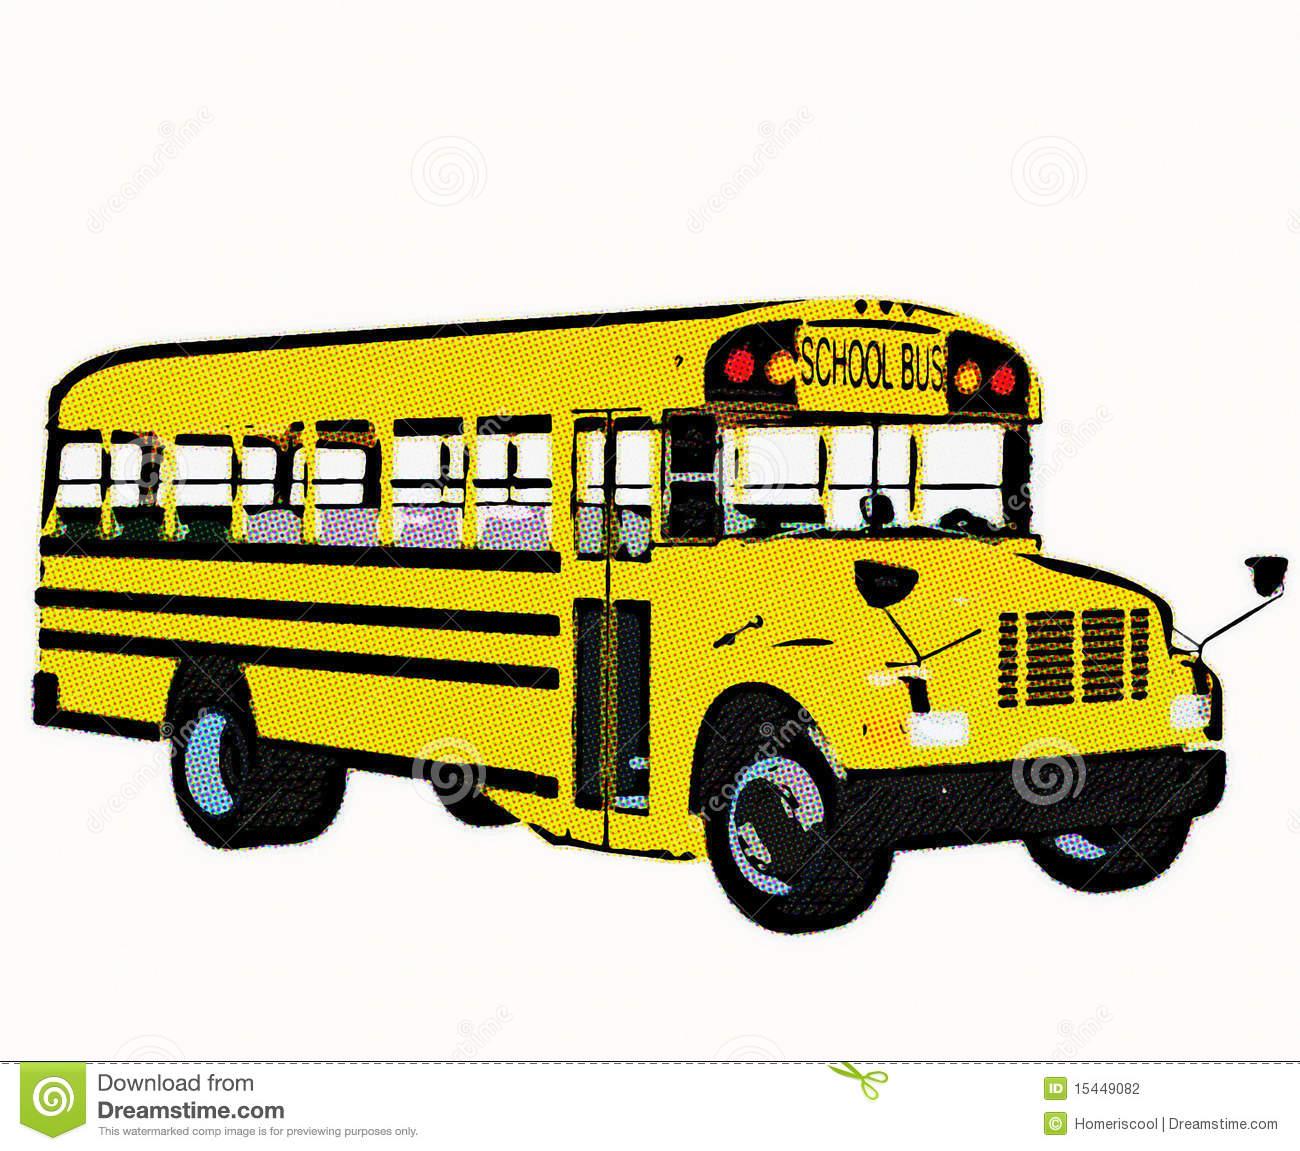 yellow bus clipart - photo #31